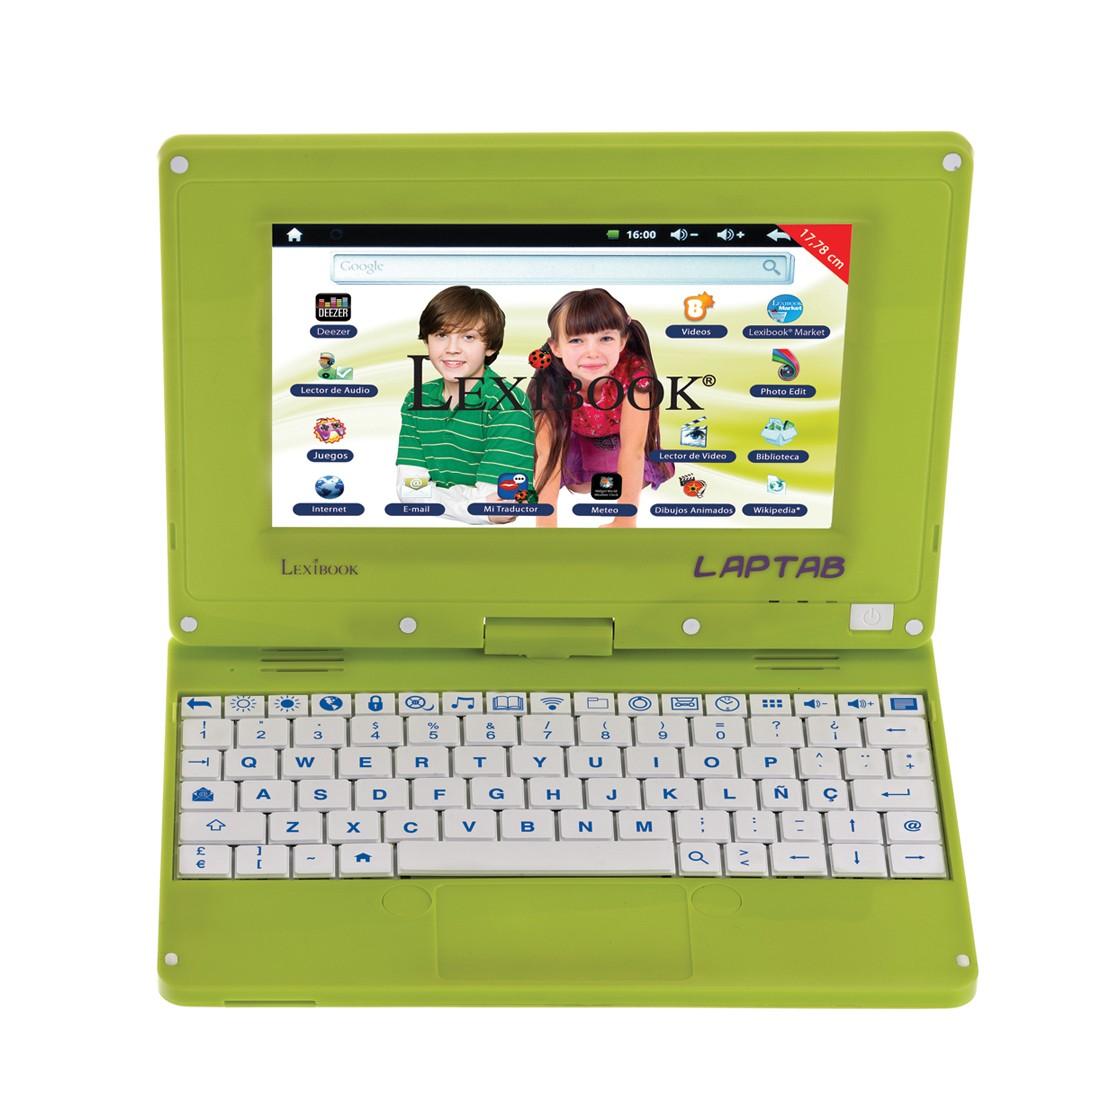 ¡LapTab es la mezcla perfecta entre un tablet y un laptop!